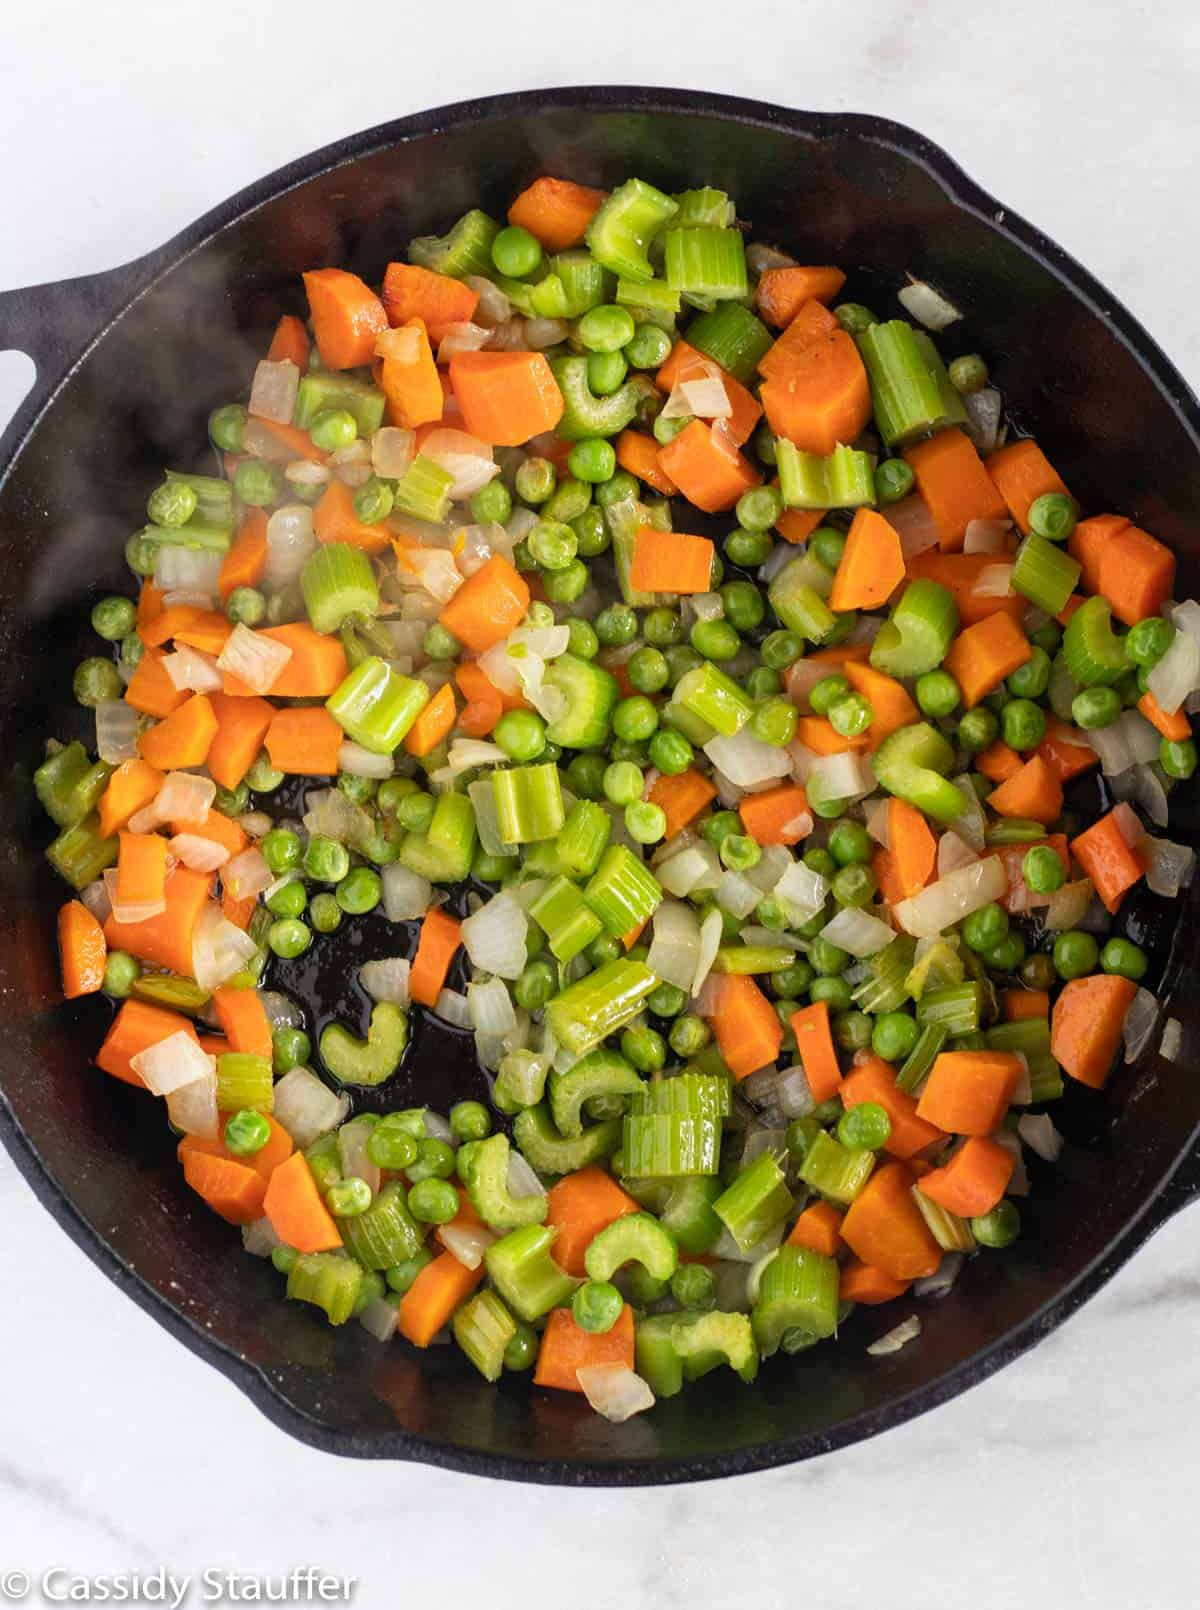 sauteing veggies in cast iron skillet